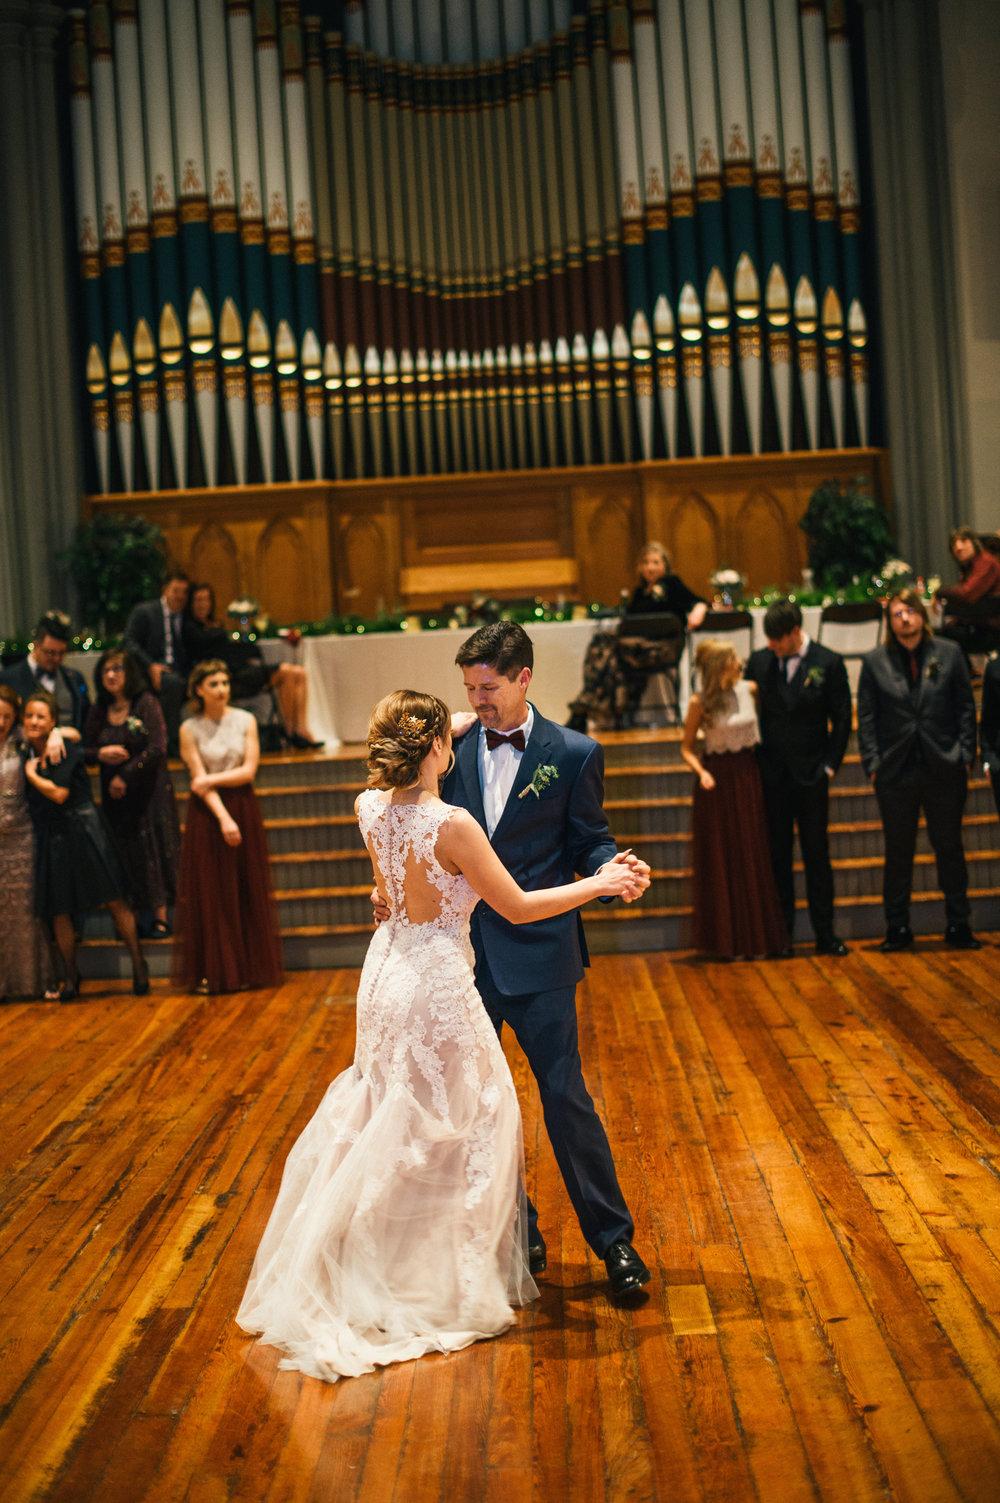 Amber and Kyles Wedding 56.jpg